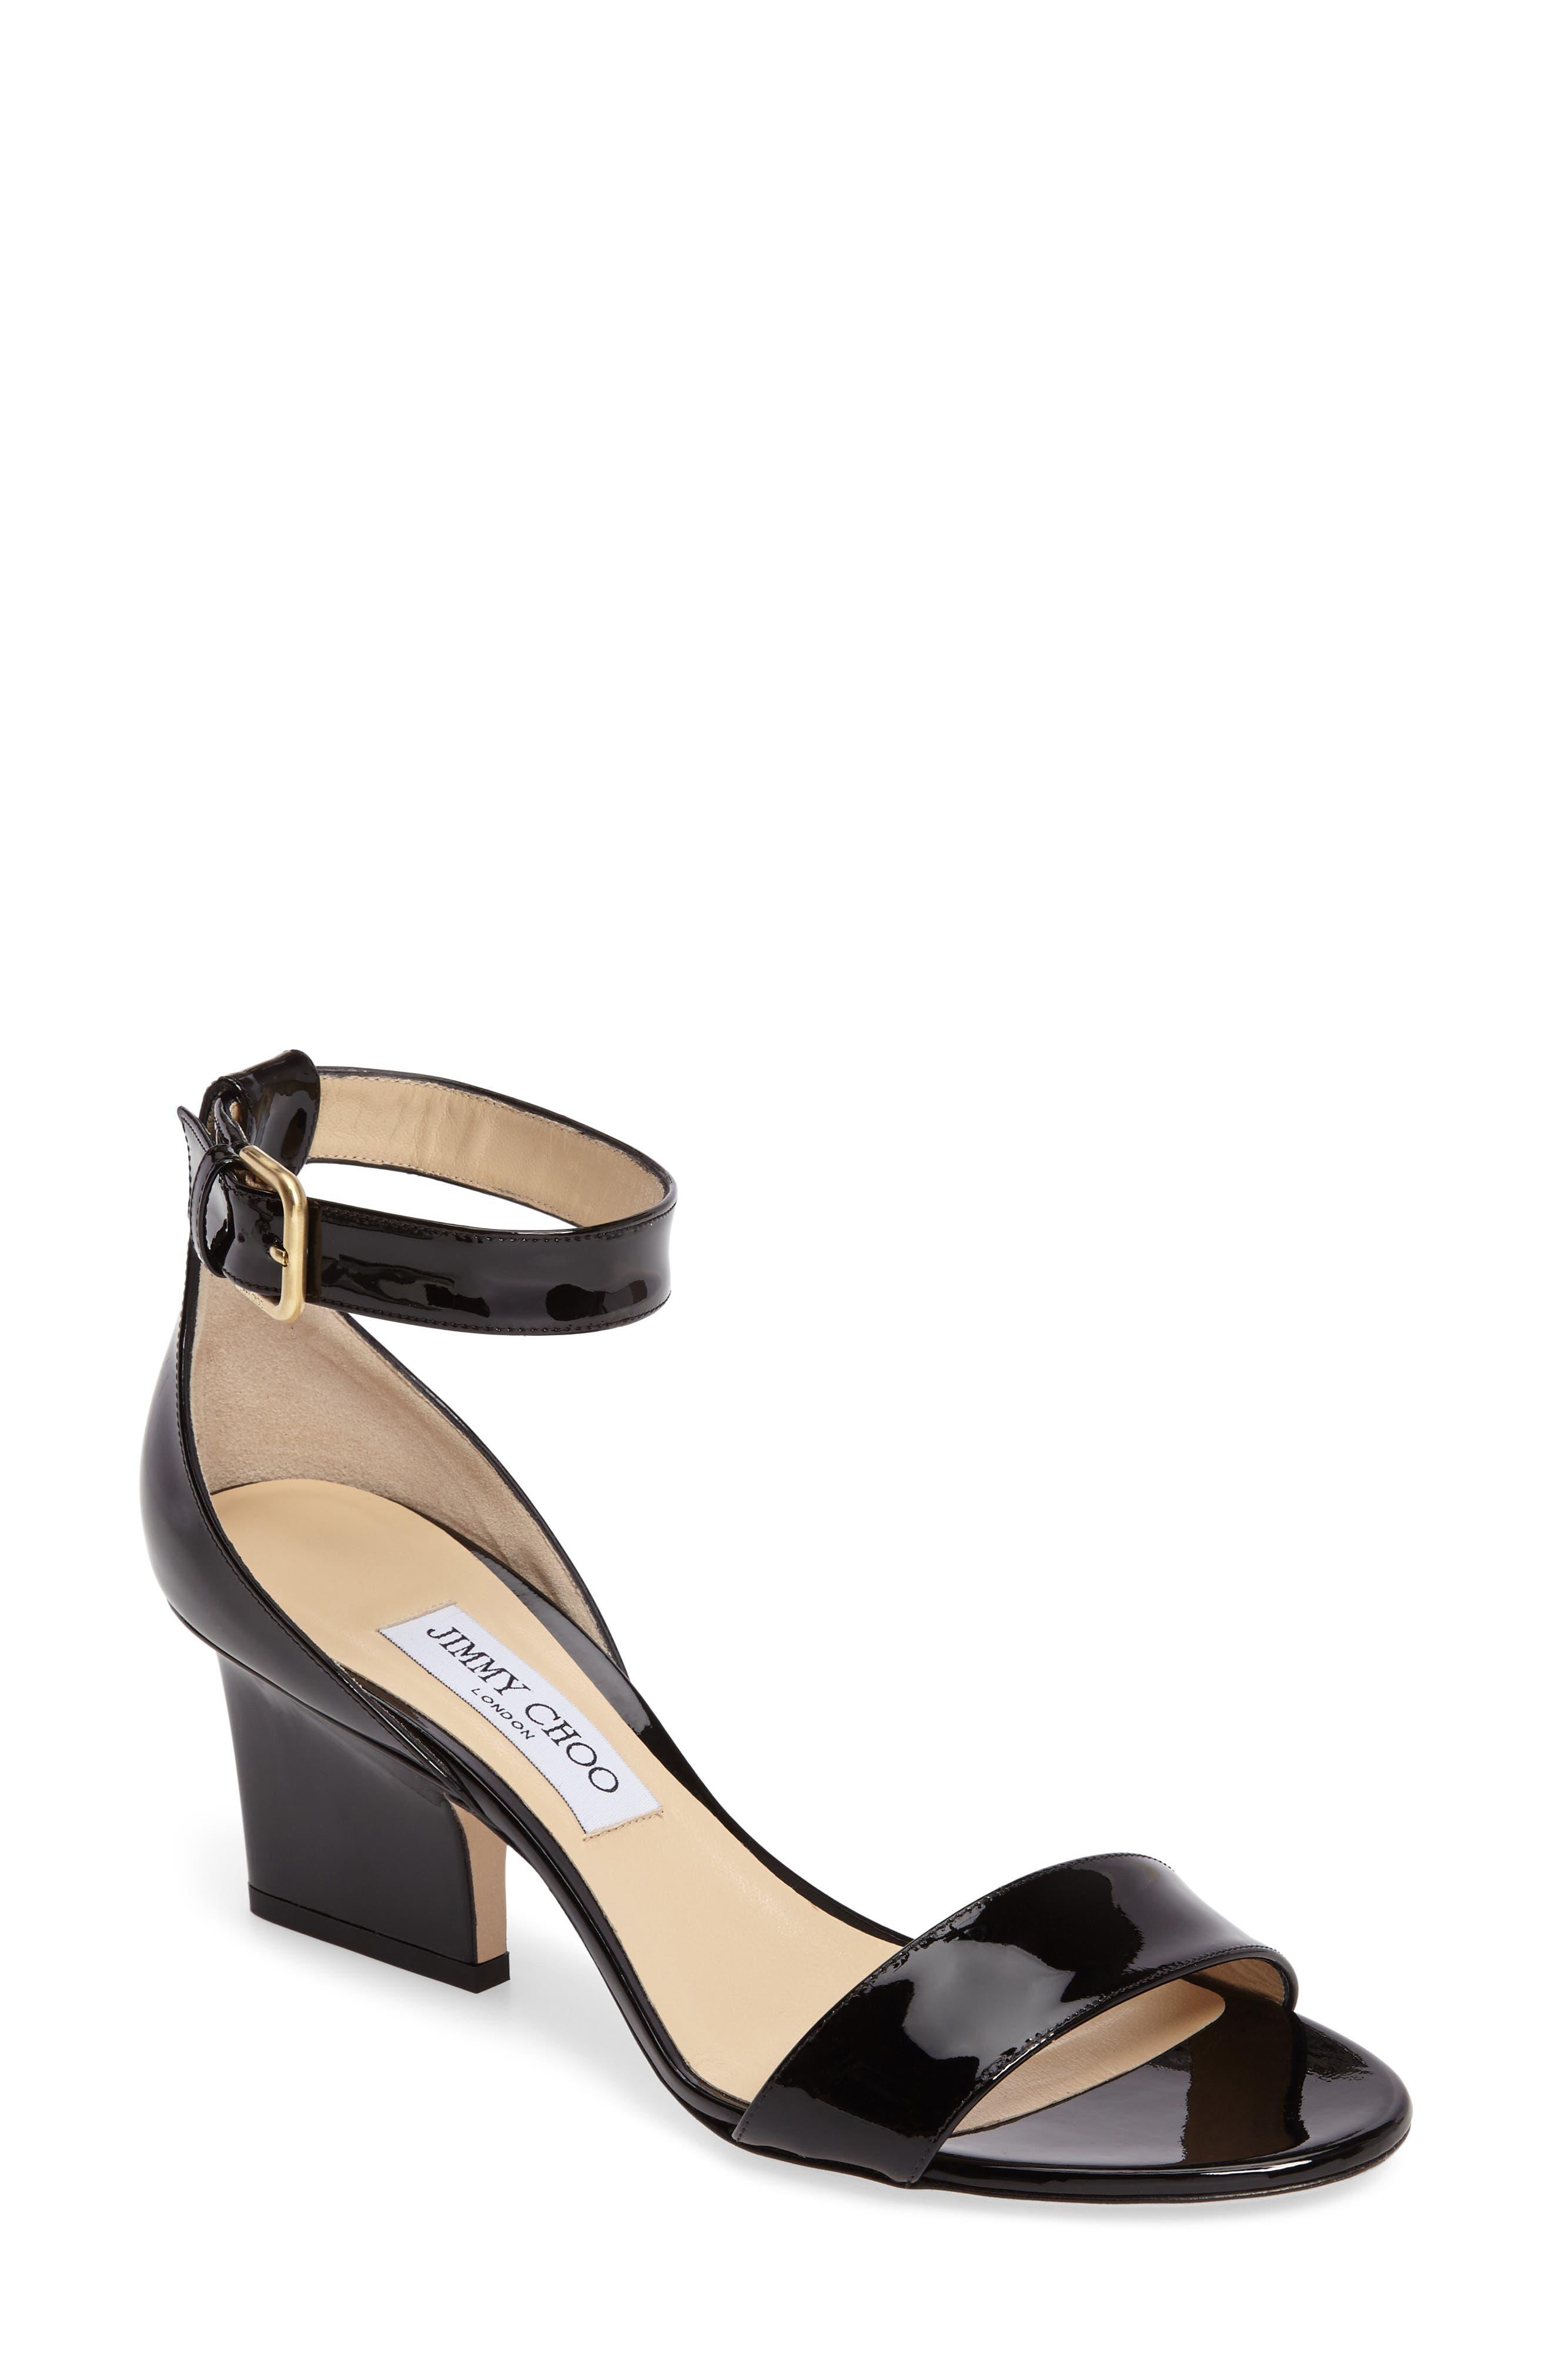 Alternate Image 1 Selected - Jimmy Choo Edina Ankle Strap Sandal (Women)